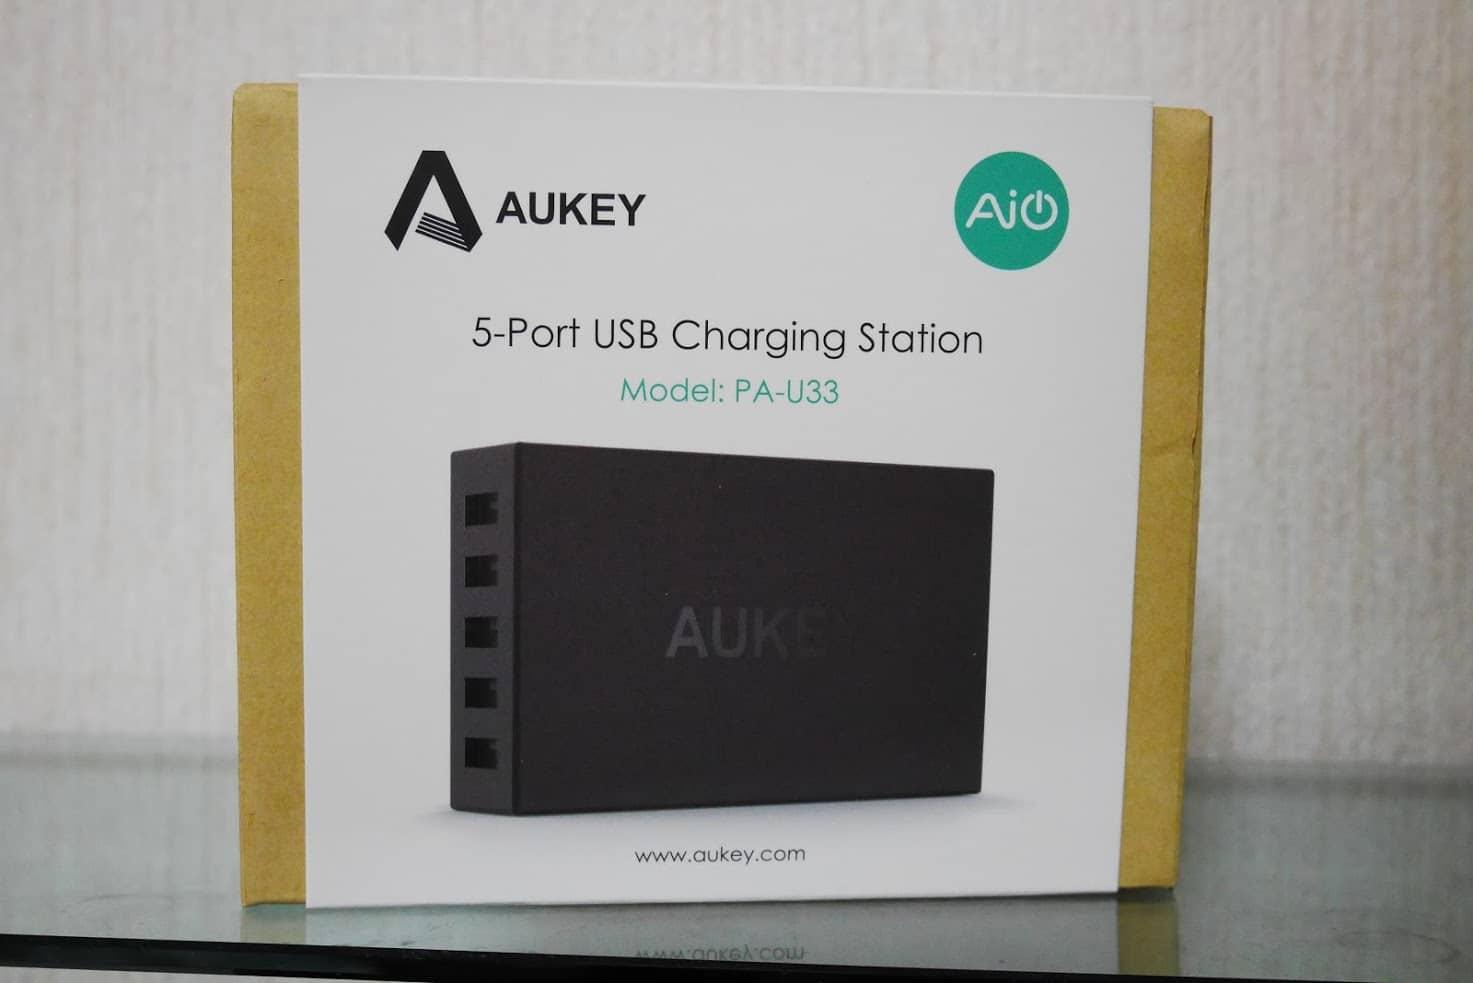 AUKEY-PA-U33-外箱